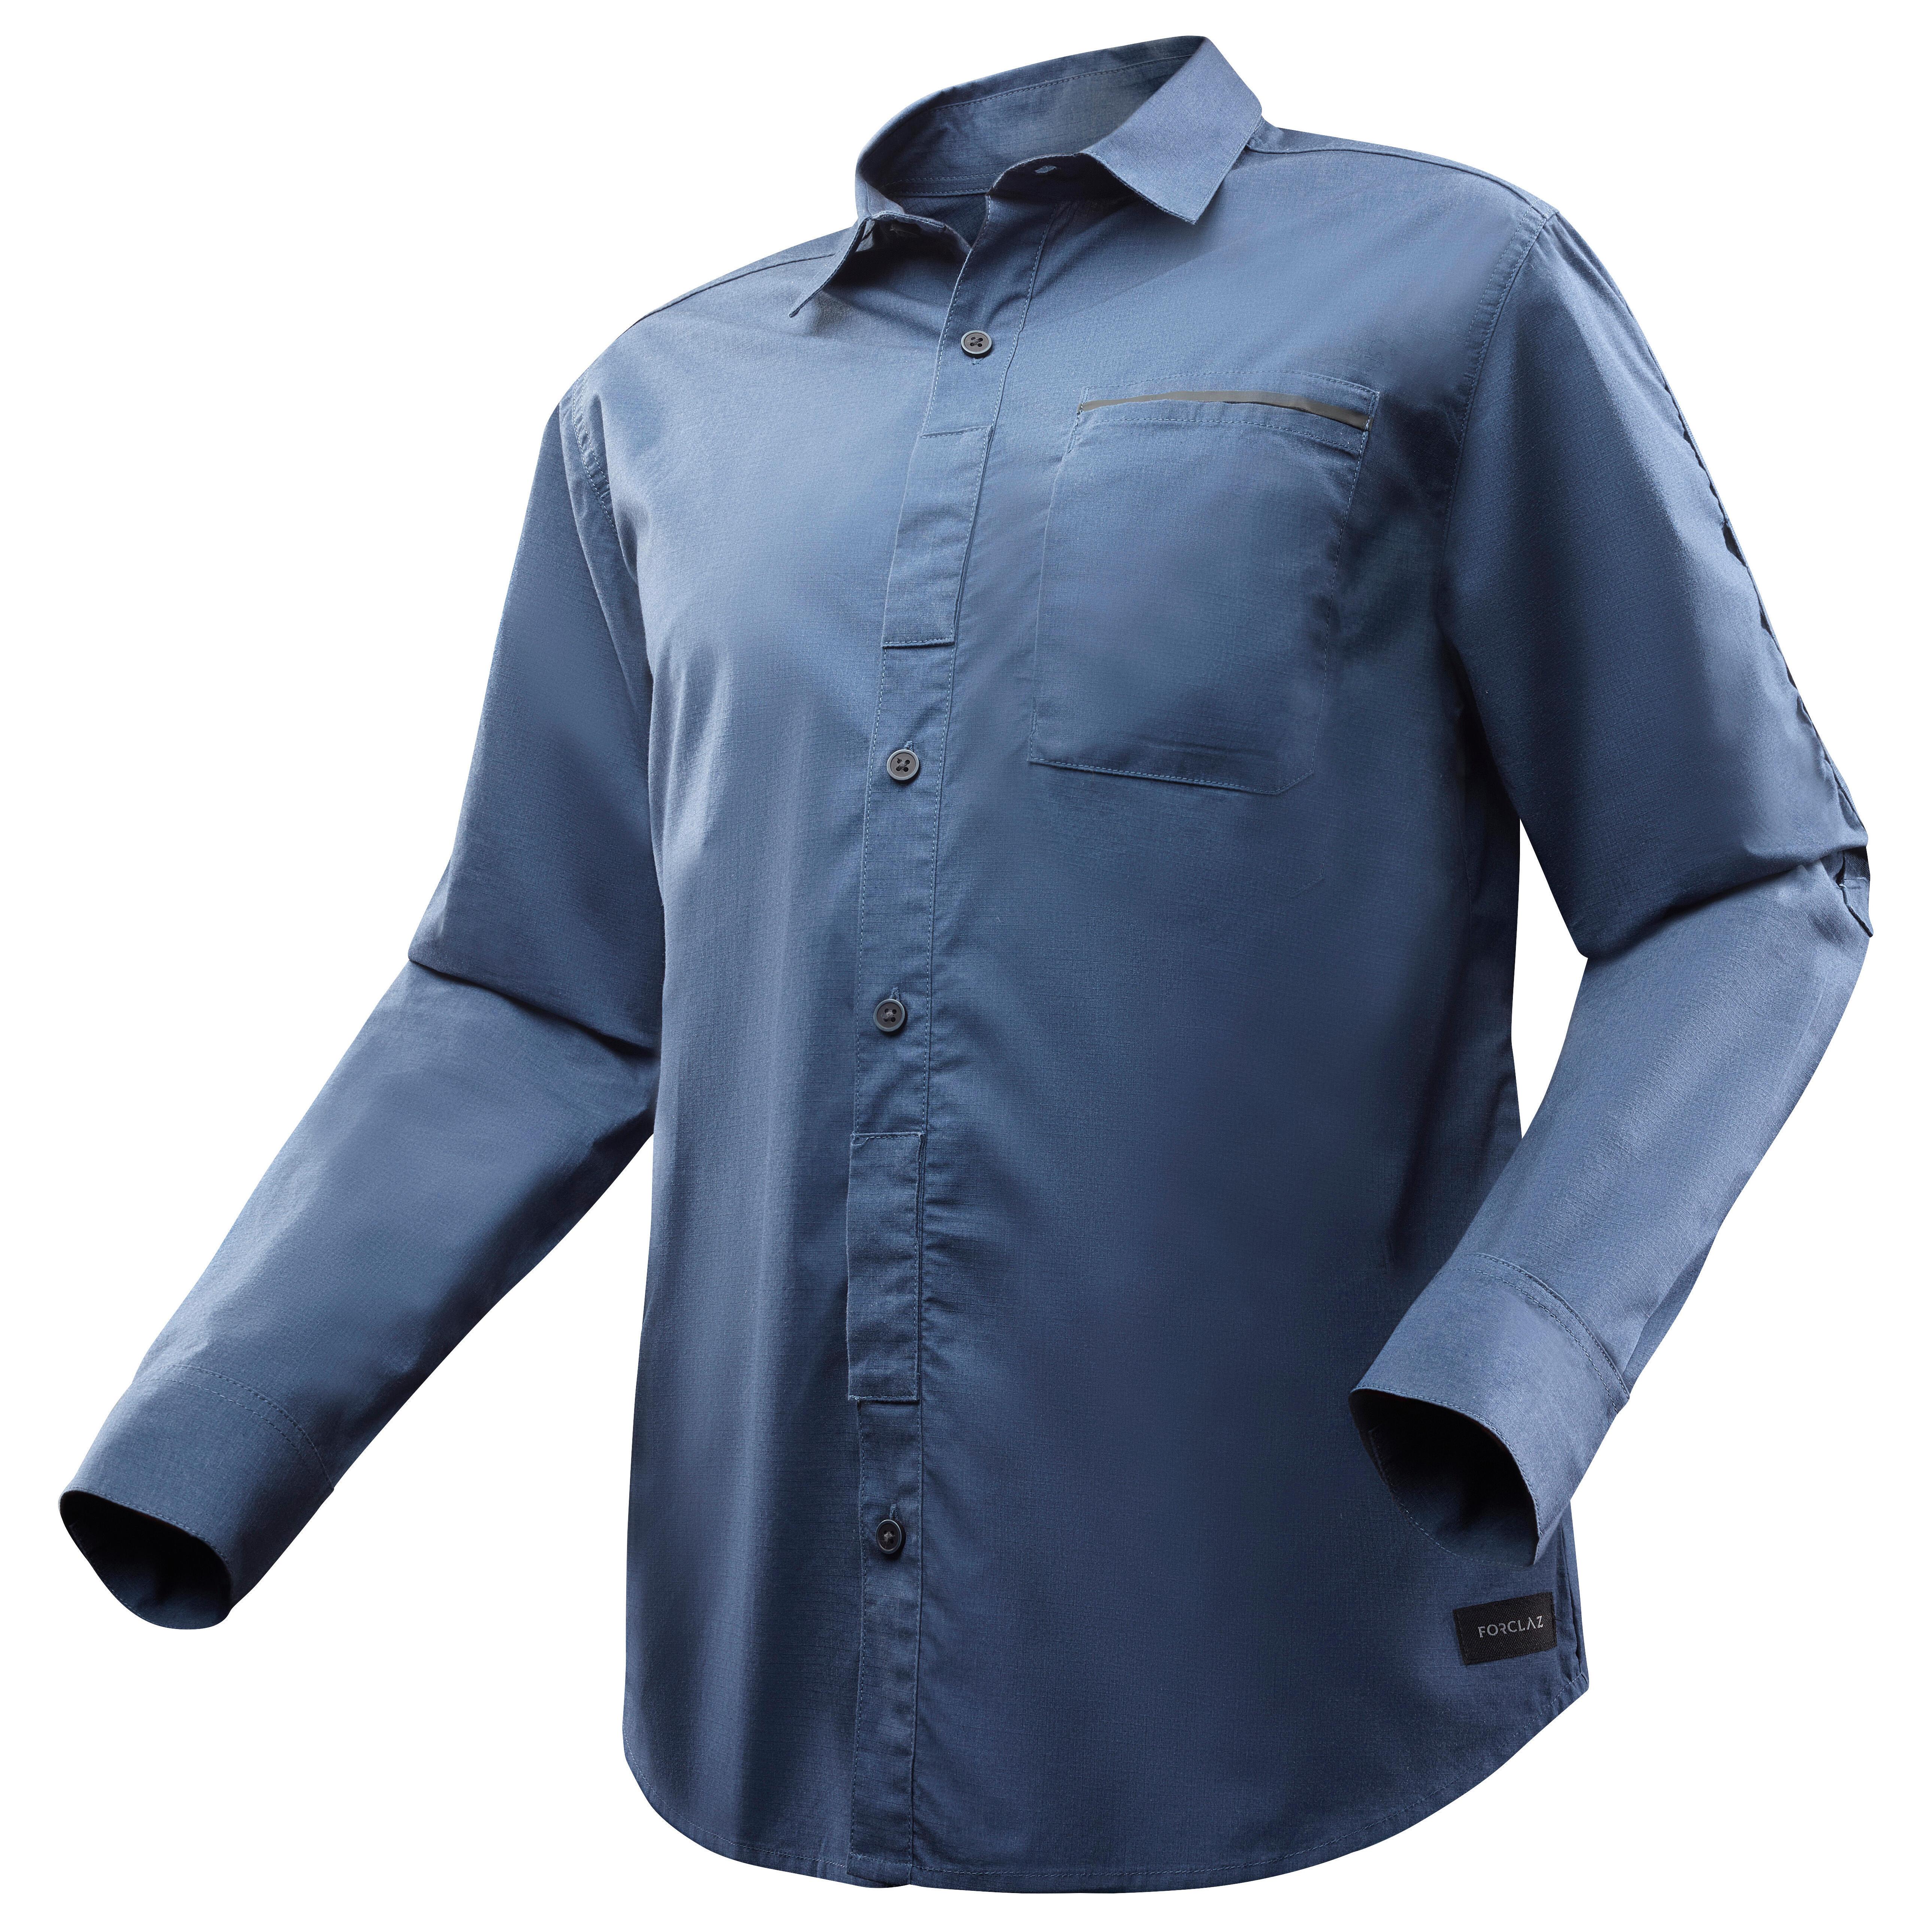 Modul Homme Chemise Longues Manches Bleu Trekking Travel500 OPkuZXi